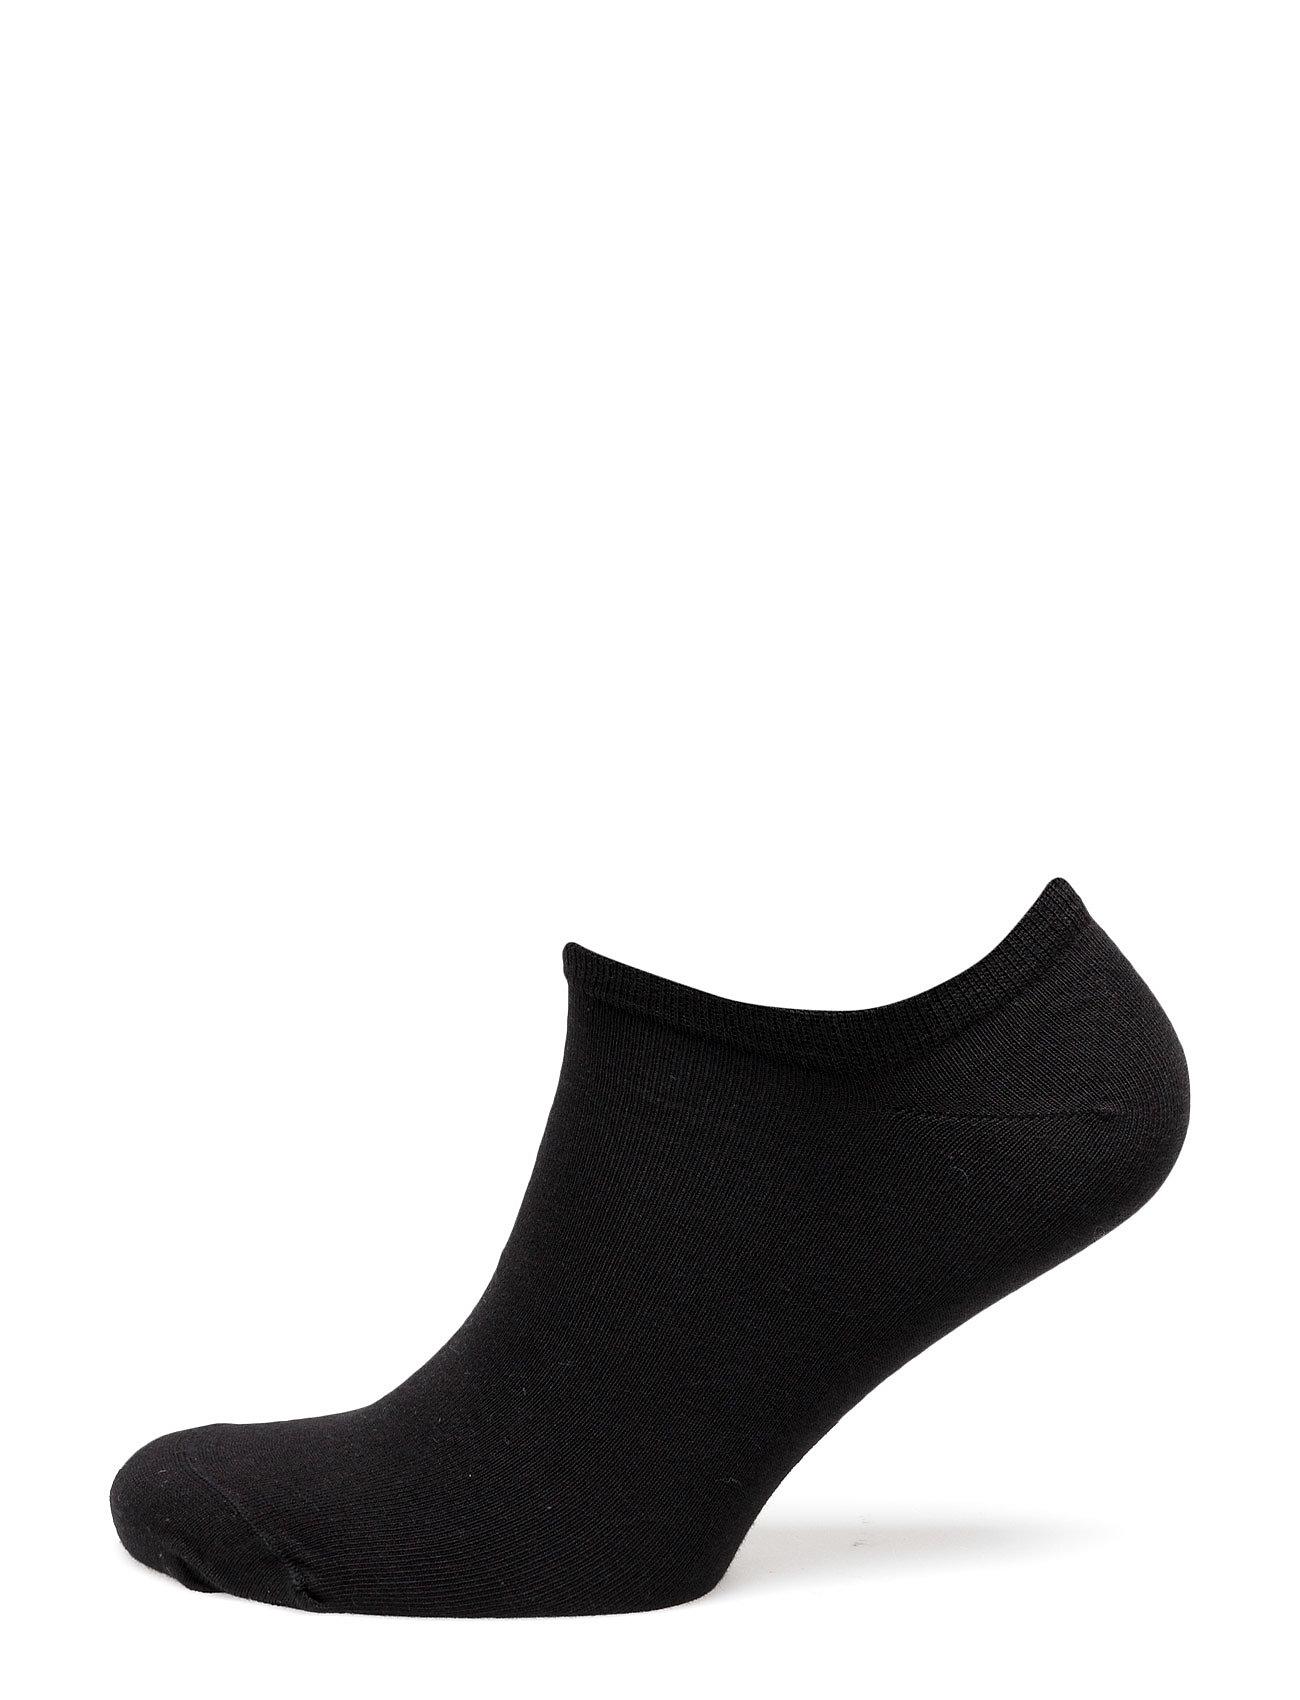 SockblackDecoy Thin Thin Ladies Sneaker Ladies xBdCoer